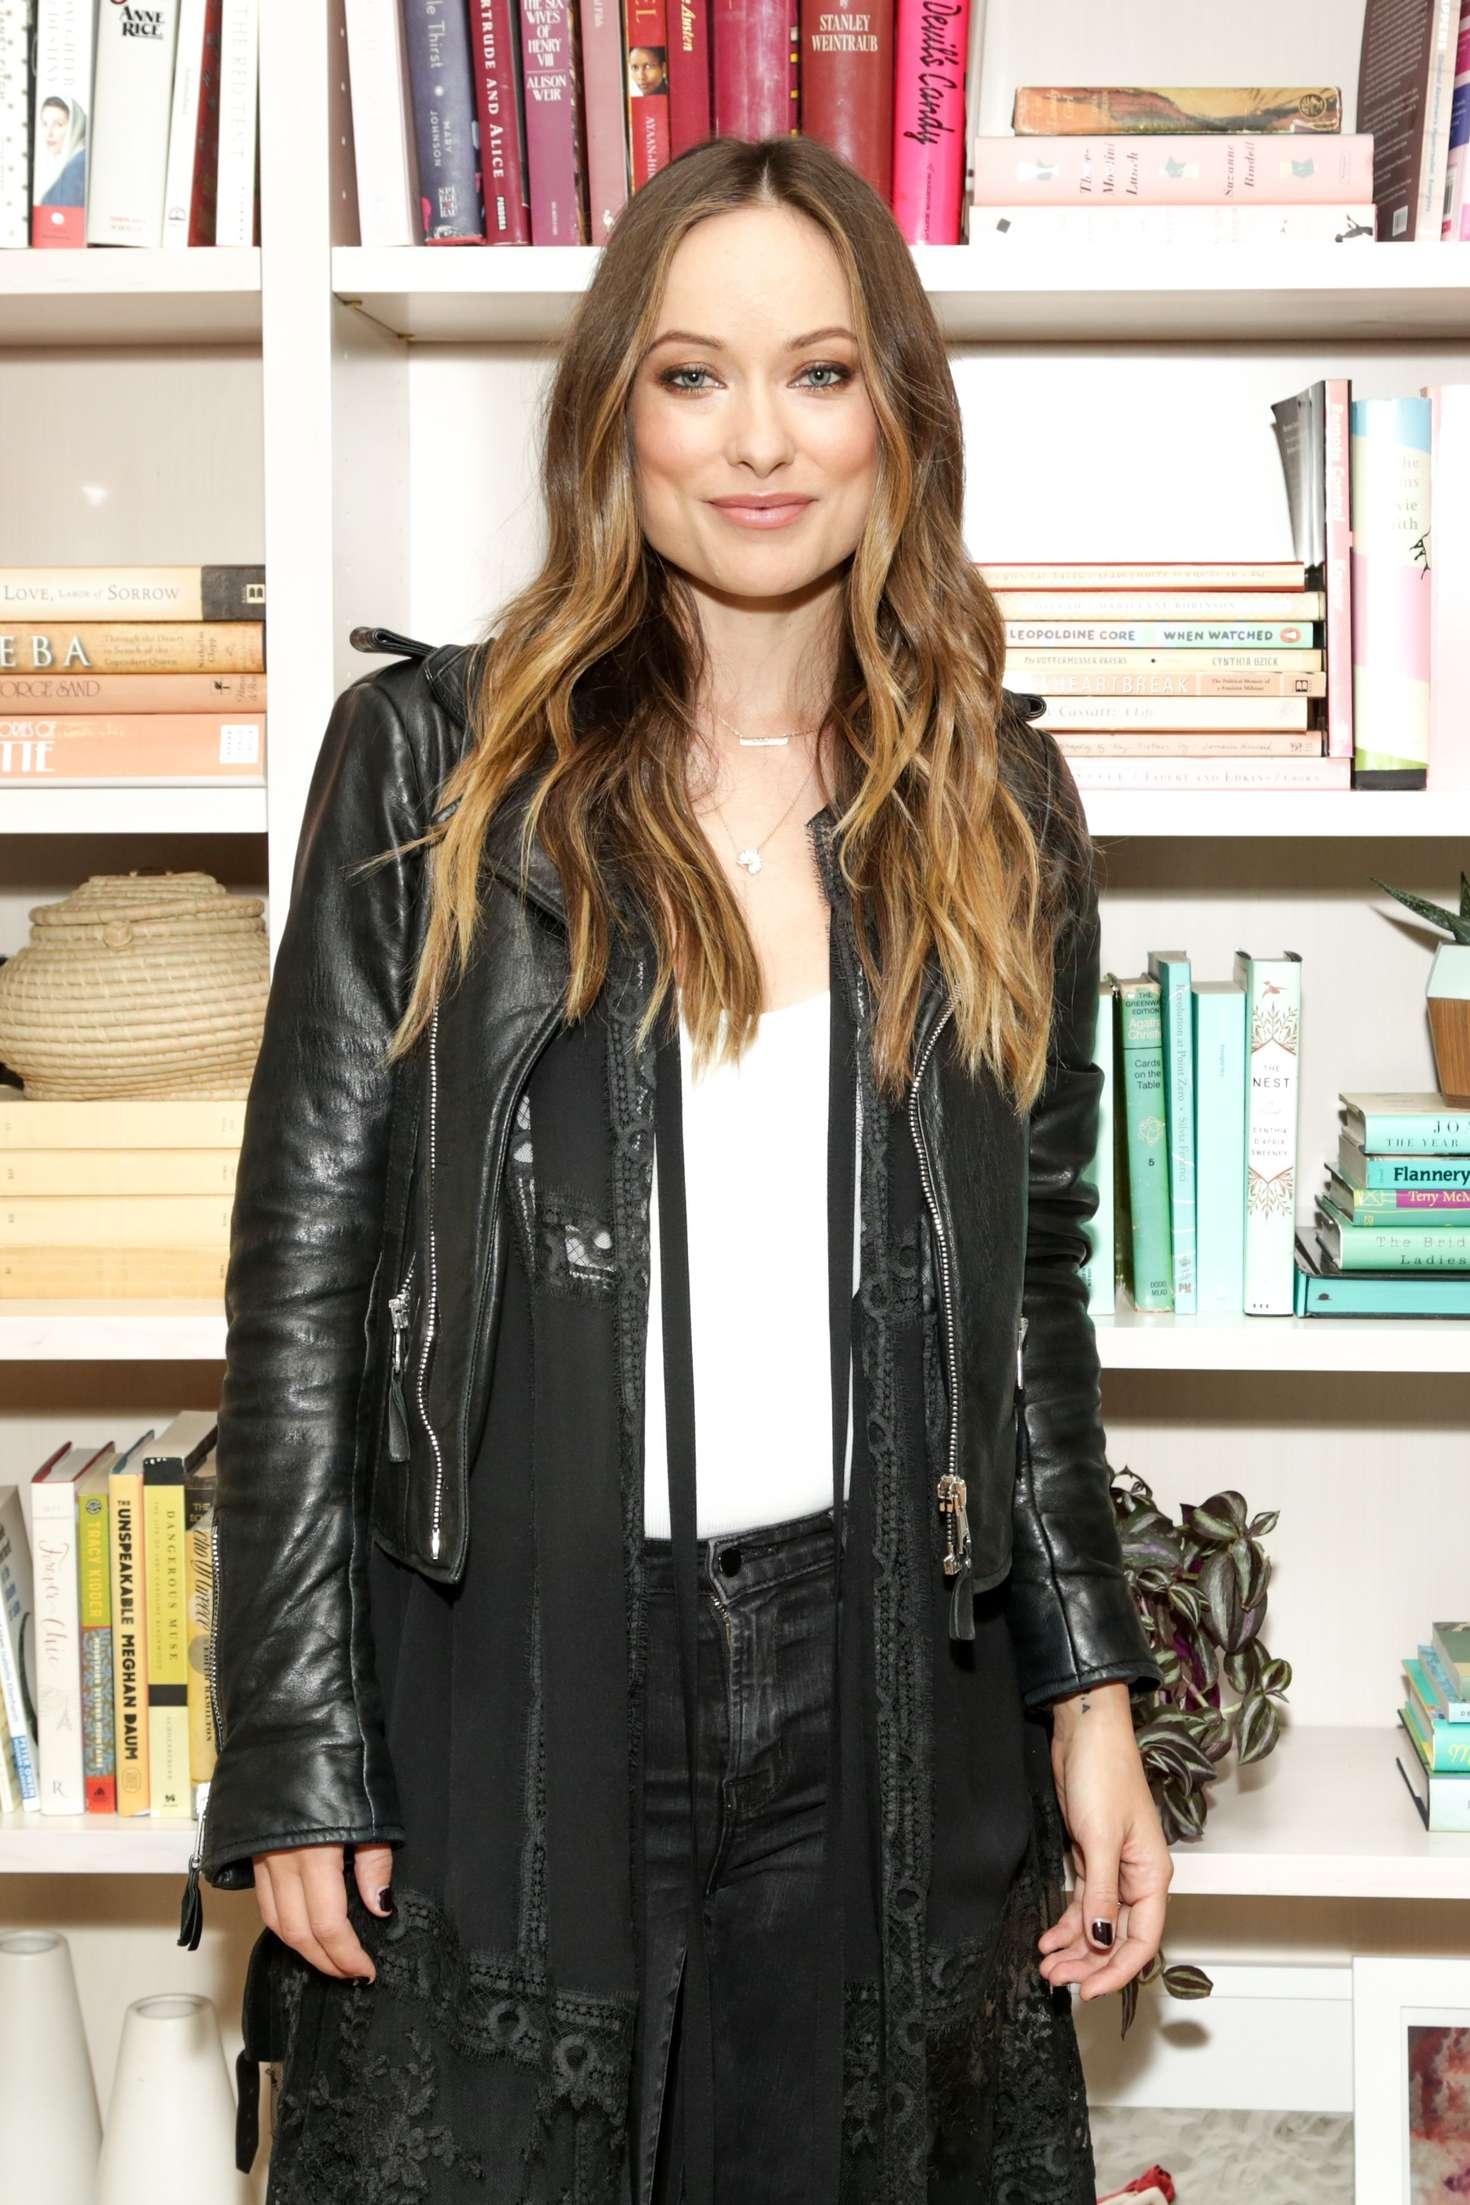 Olivia Wilde - Harper's Bazaar Daring Issue Celebration in NYC